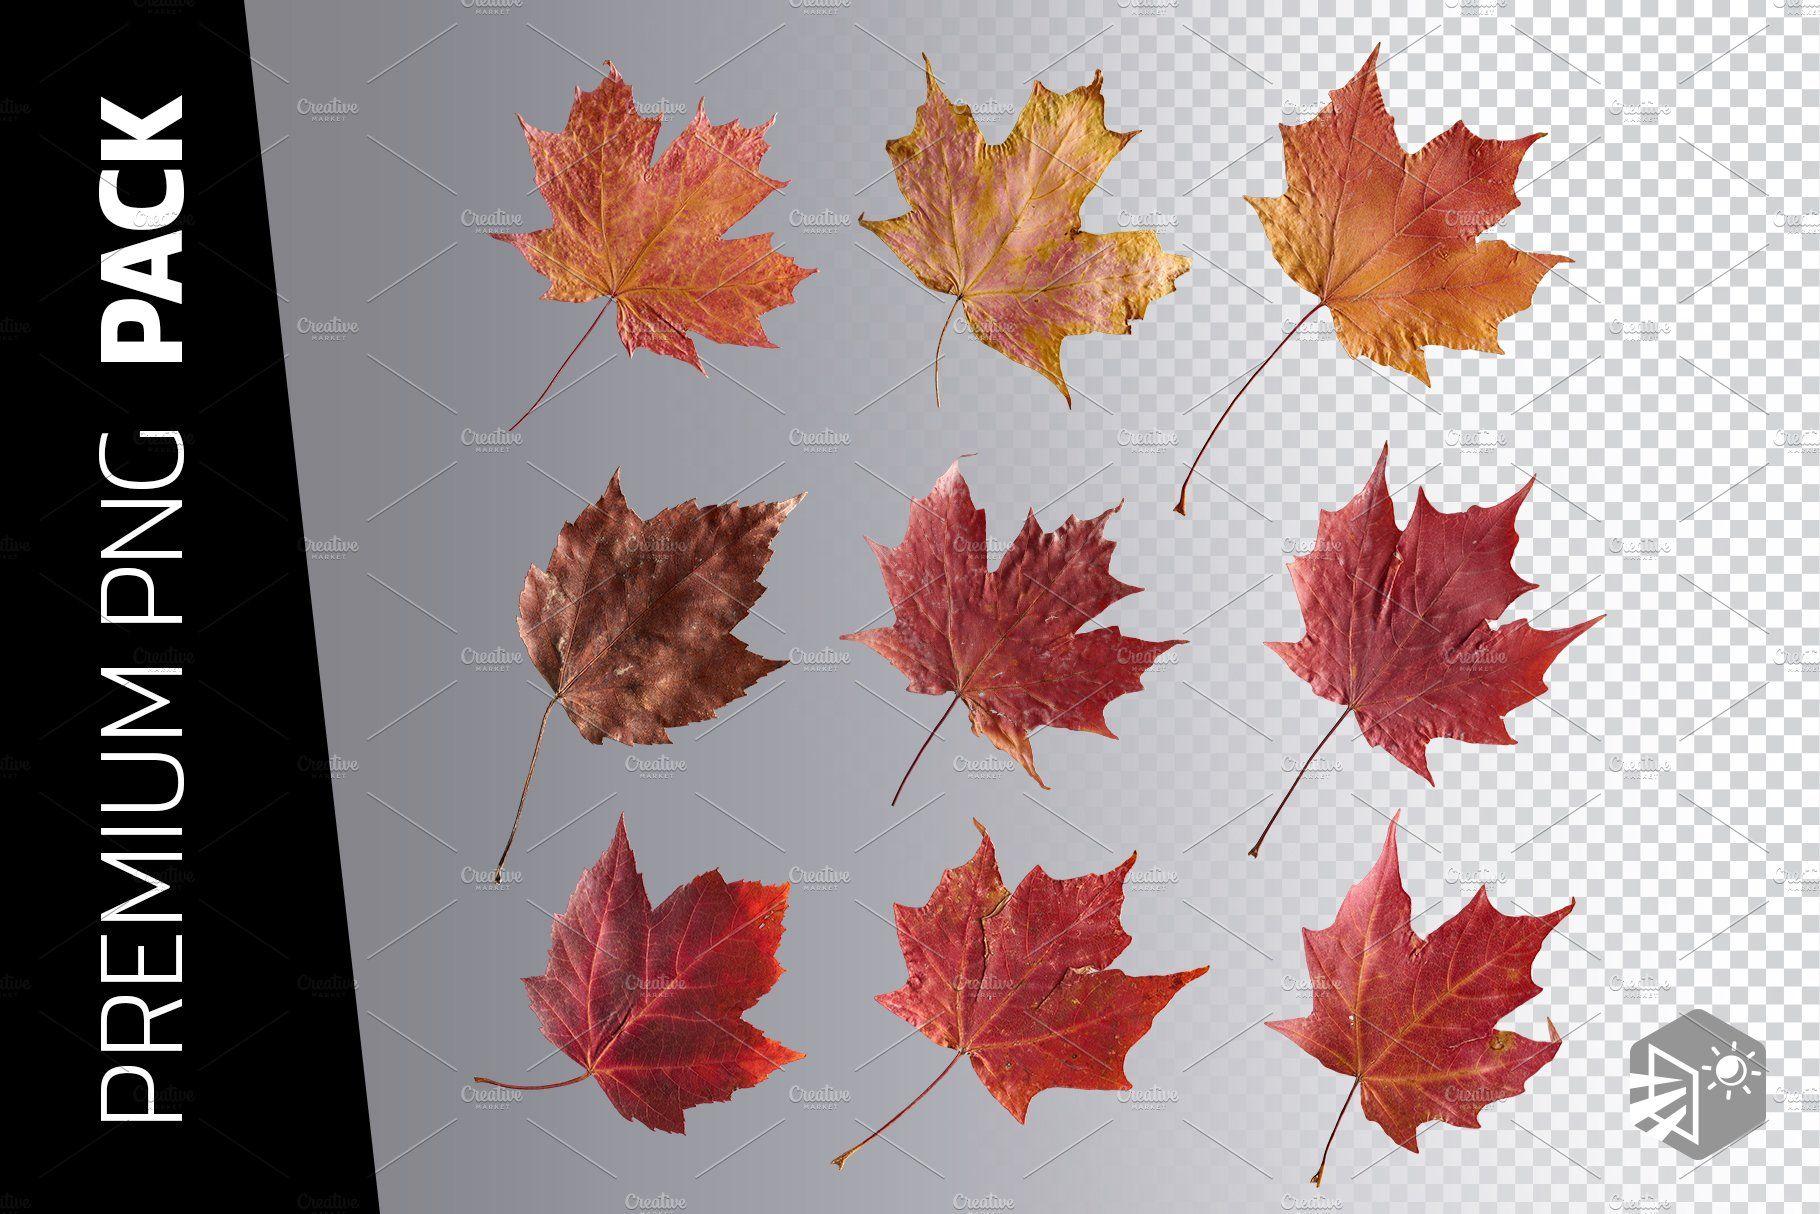 9 Red Maple Leaf Png Images Maple Leaf Png Images Png